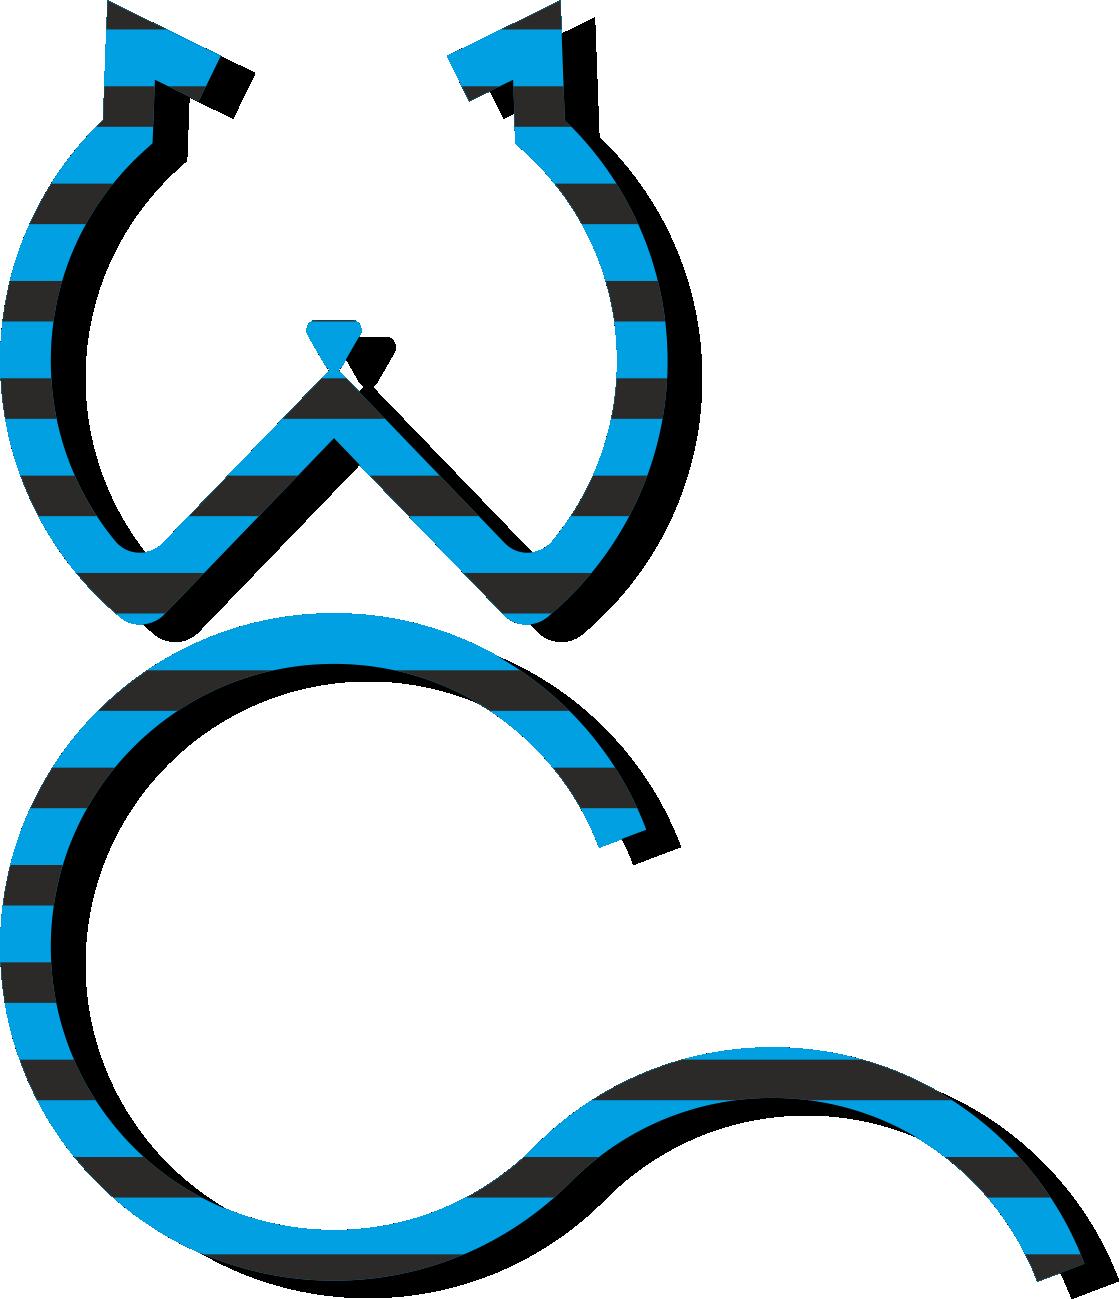 Создание логотипа WeCats фото f_3325f1adf4546c30.png